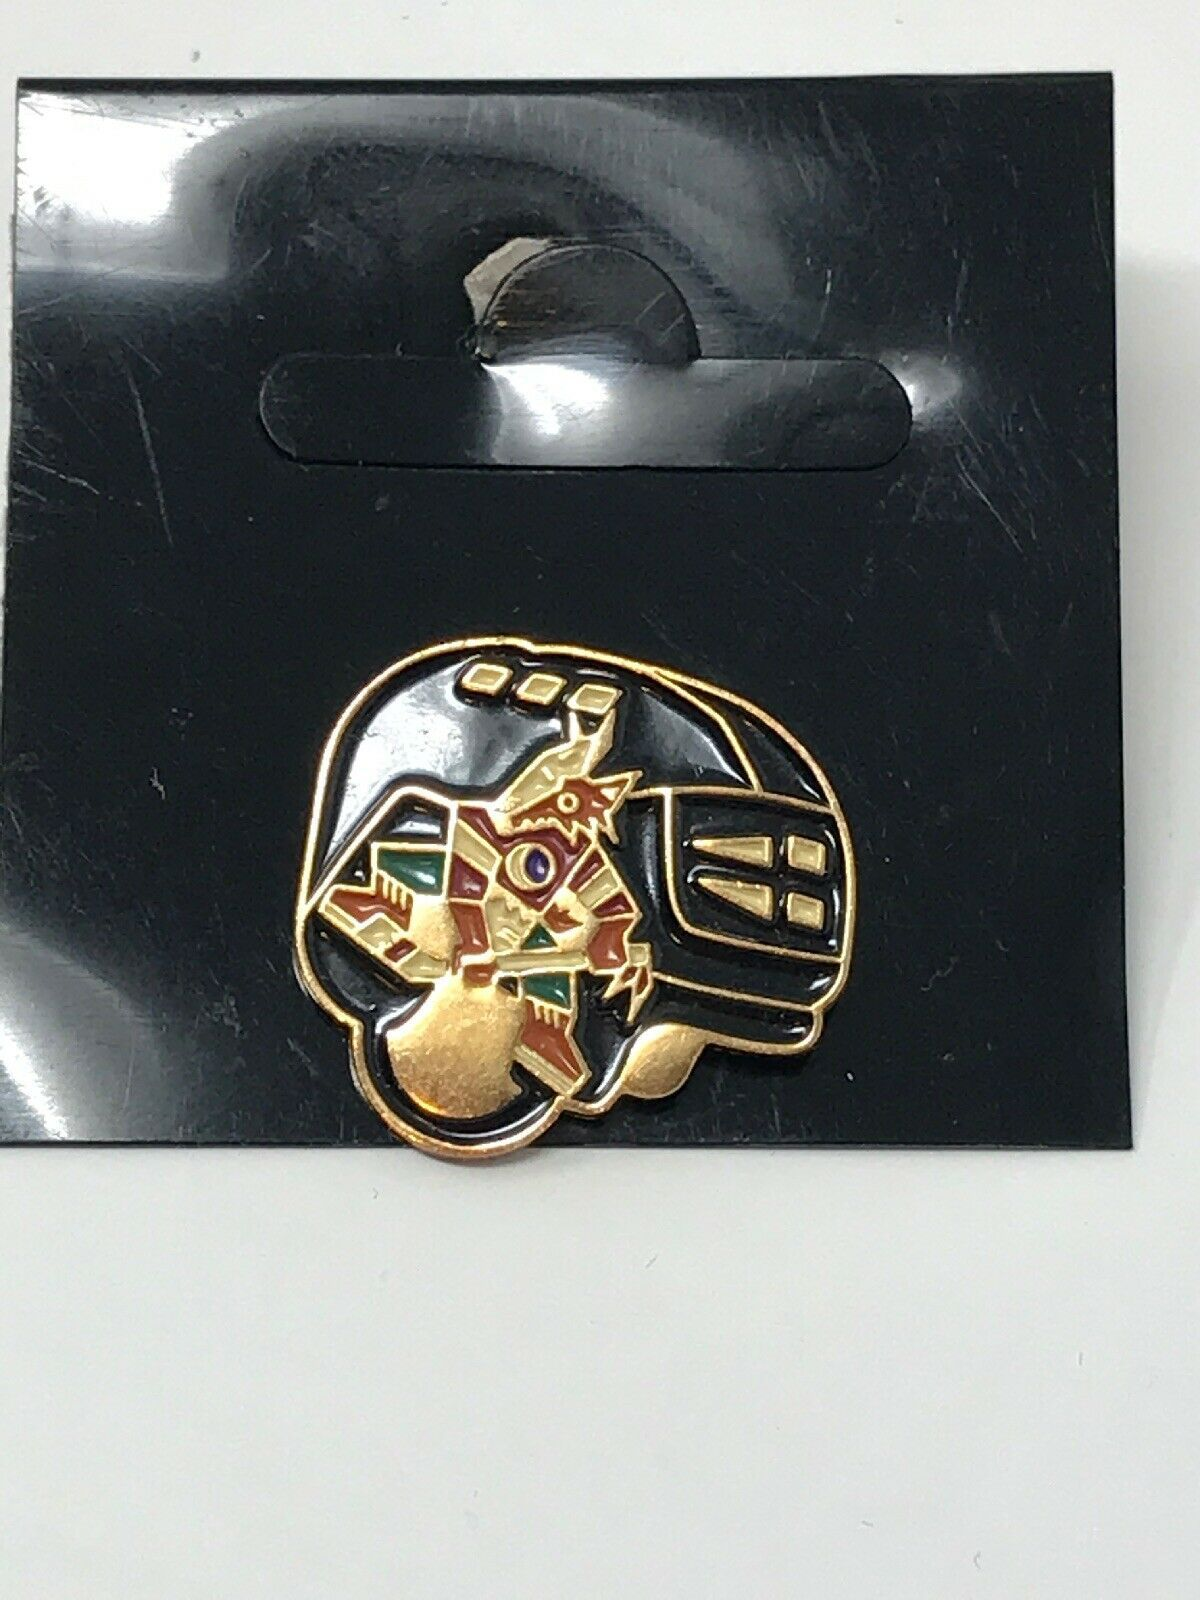 NHL Phoenix Arizona Coyotes VTG Logo Pin Helmet Coyote New NOS image 3